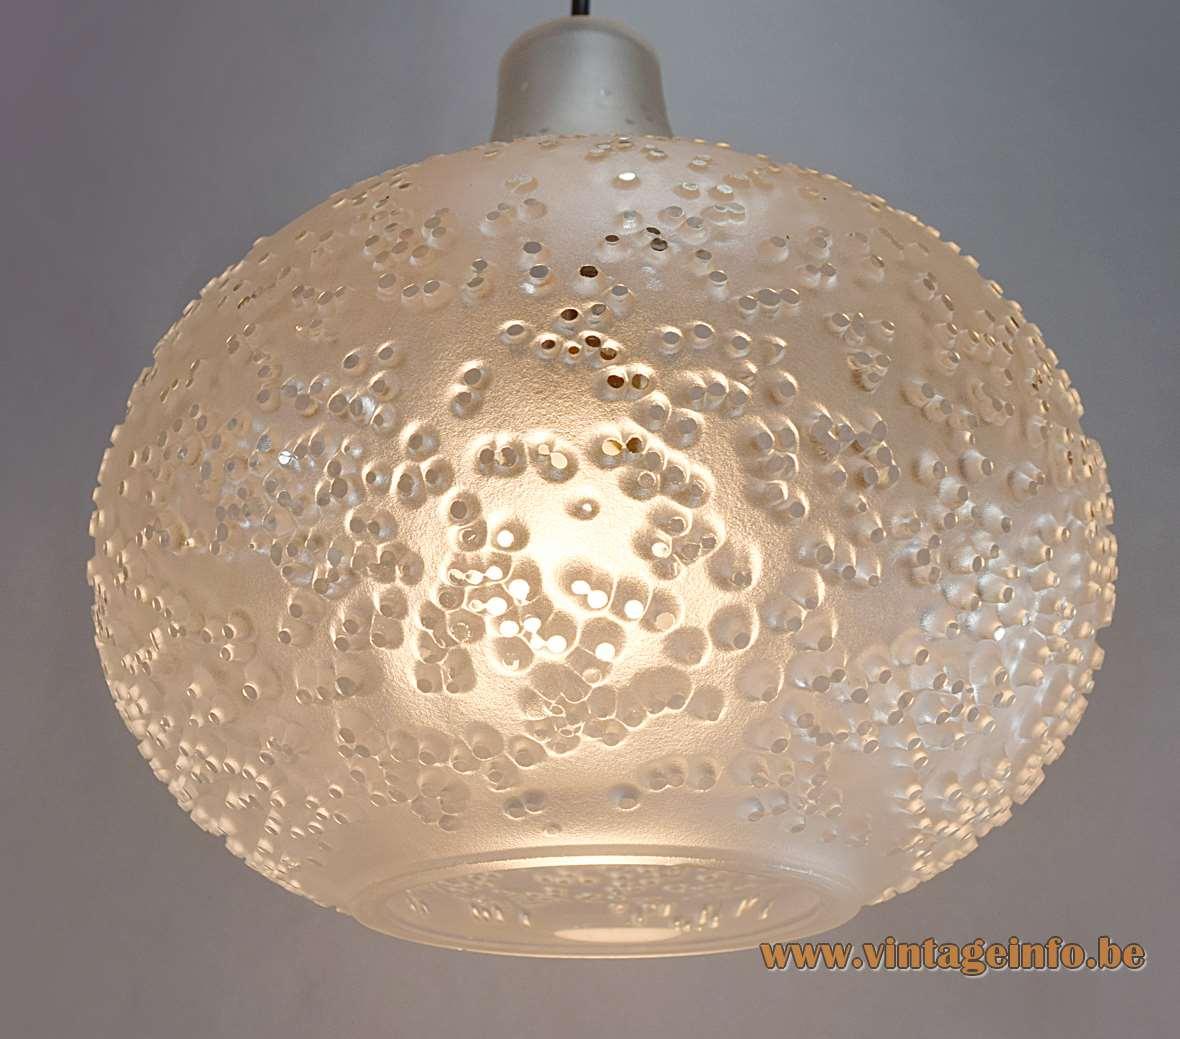 Peill + Putzler Patmos Pendant Lamp Horst Tüselmann clear frosted glass dots spots 1960s 1970s Mid-Century Modern MCM